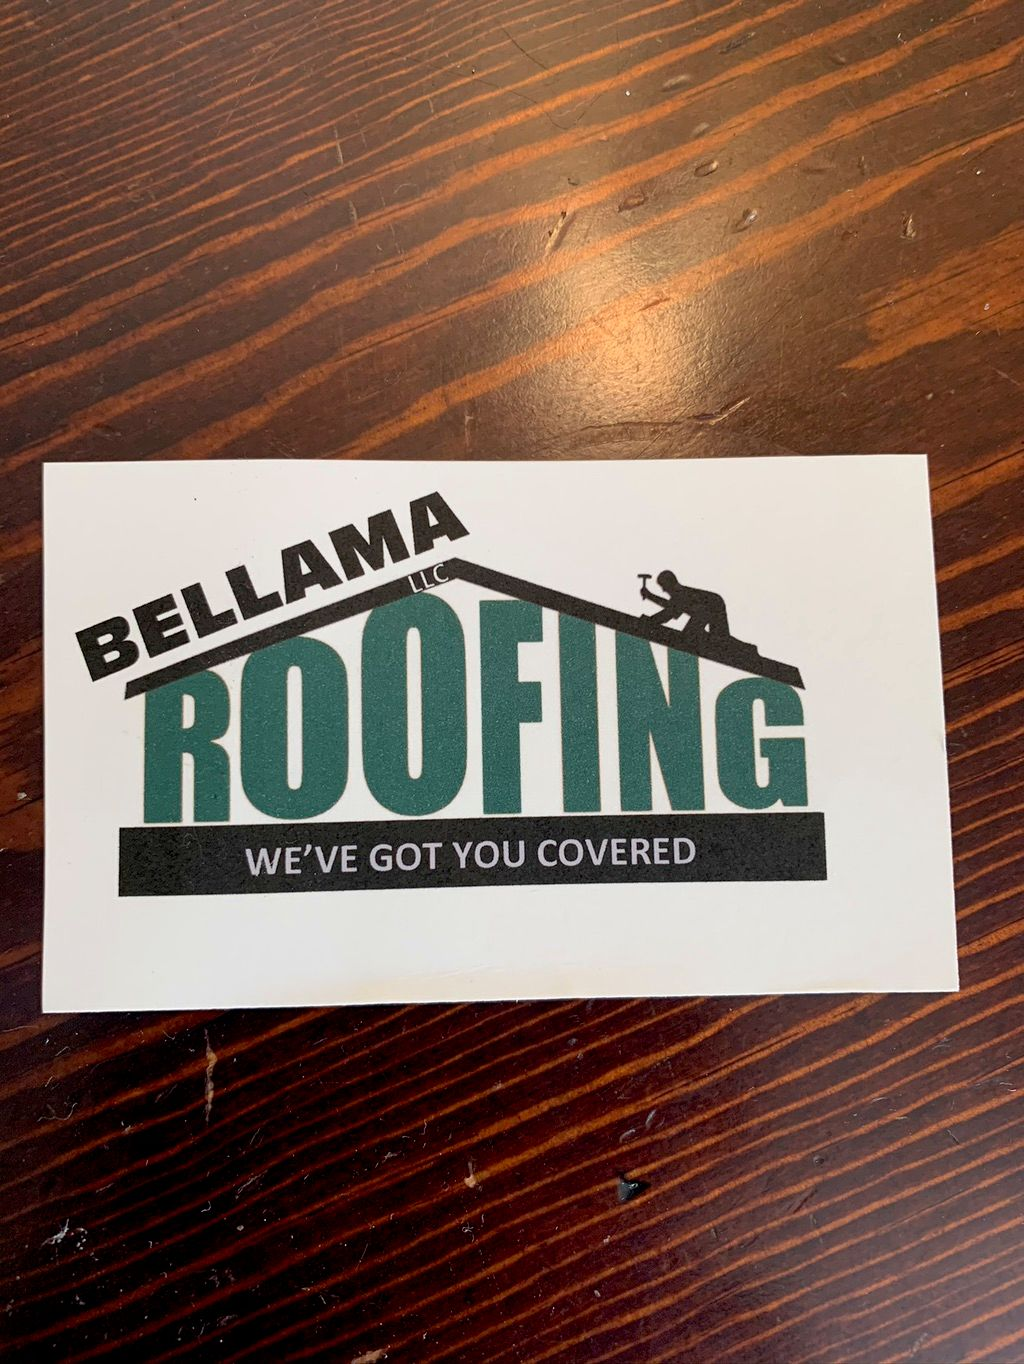 Bellama Roofing